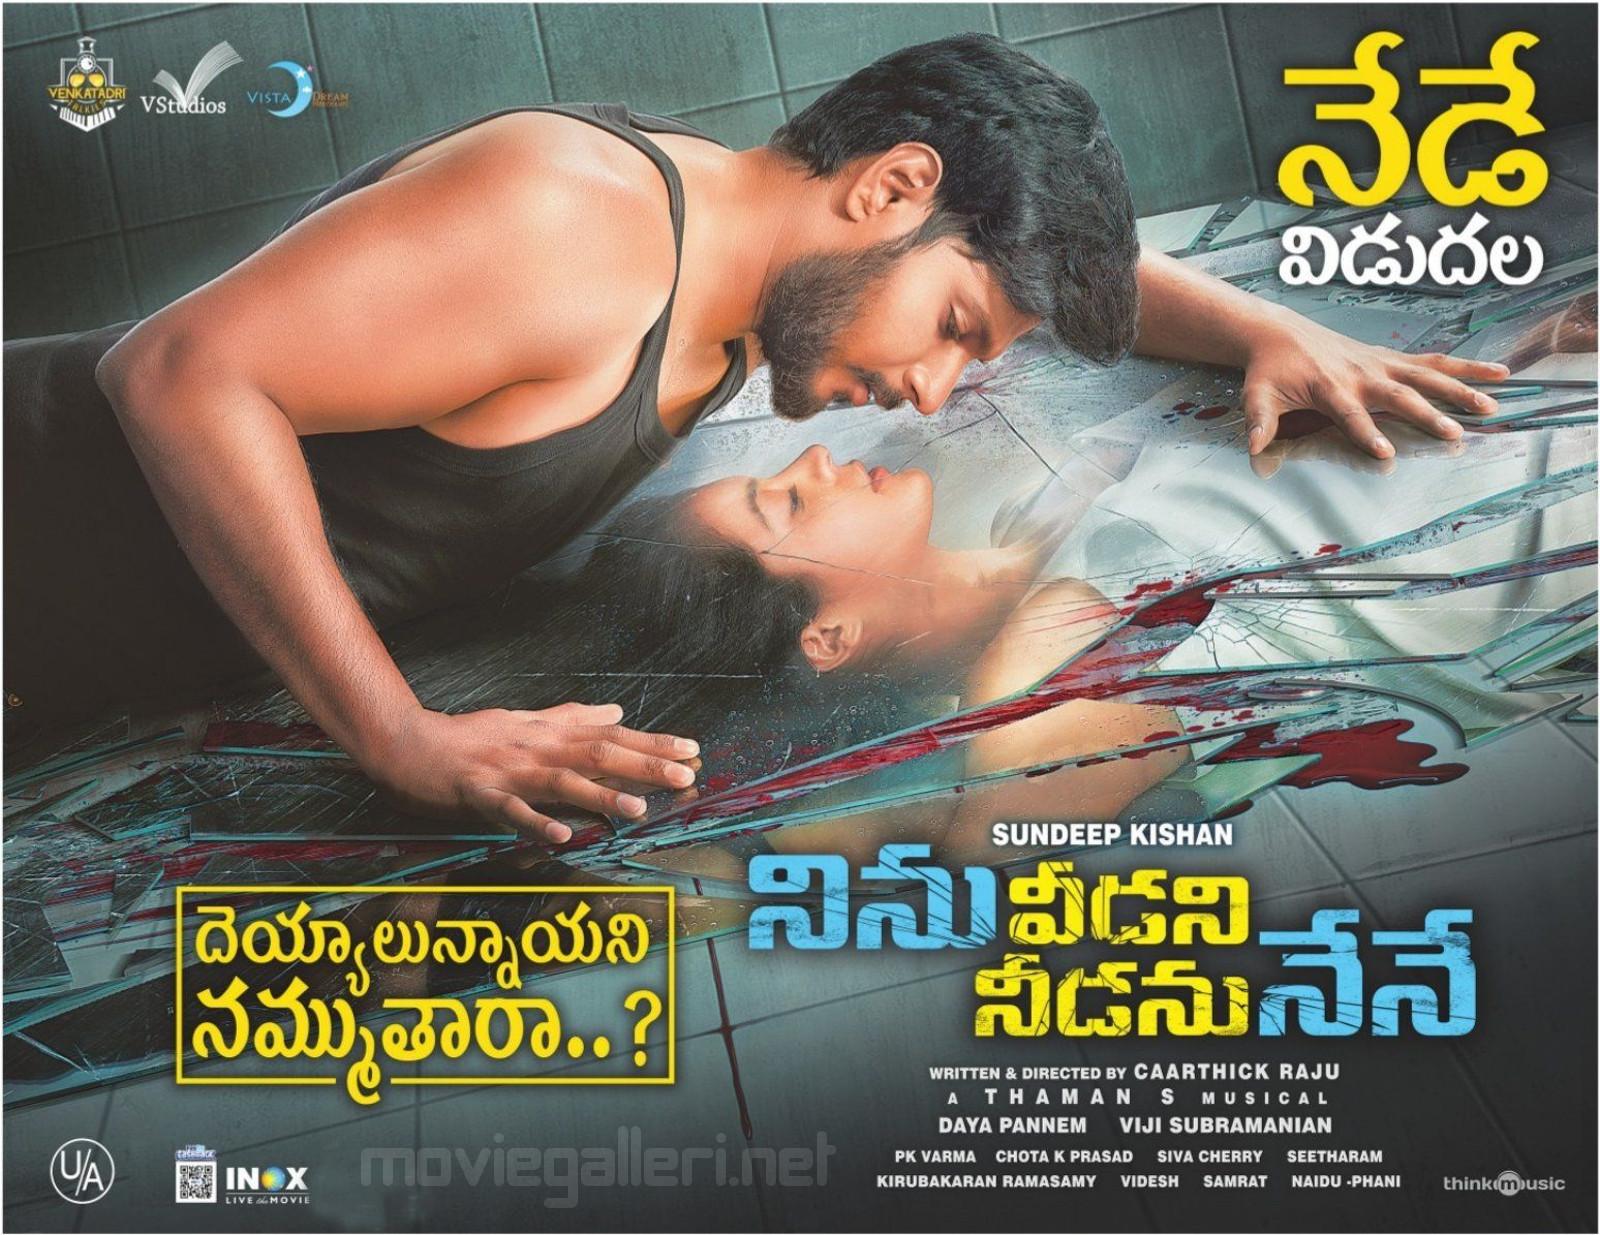 Sundeep Kishan Anya Singh Ninu Veedani Needanu Nene Movie Release Today Posters